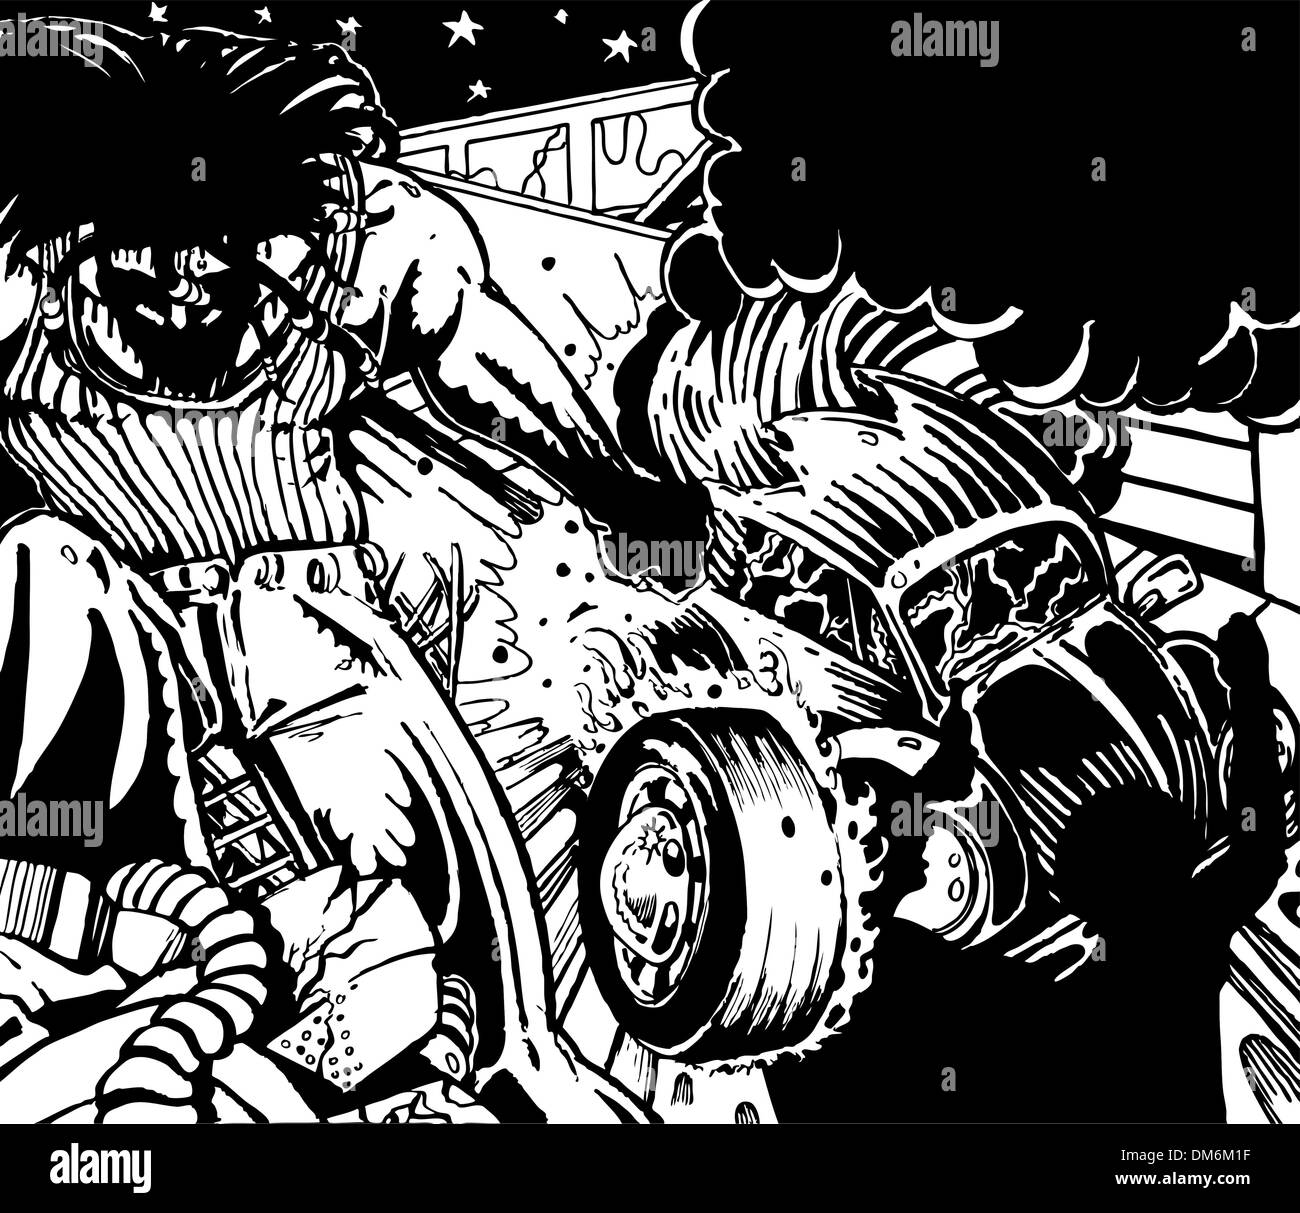 Street Riot - Stock Vector